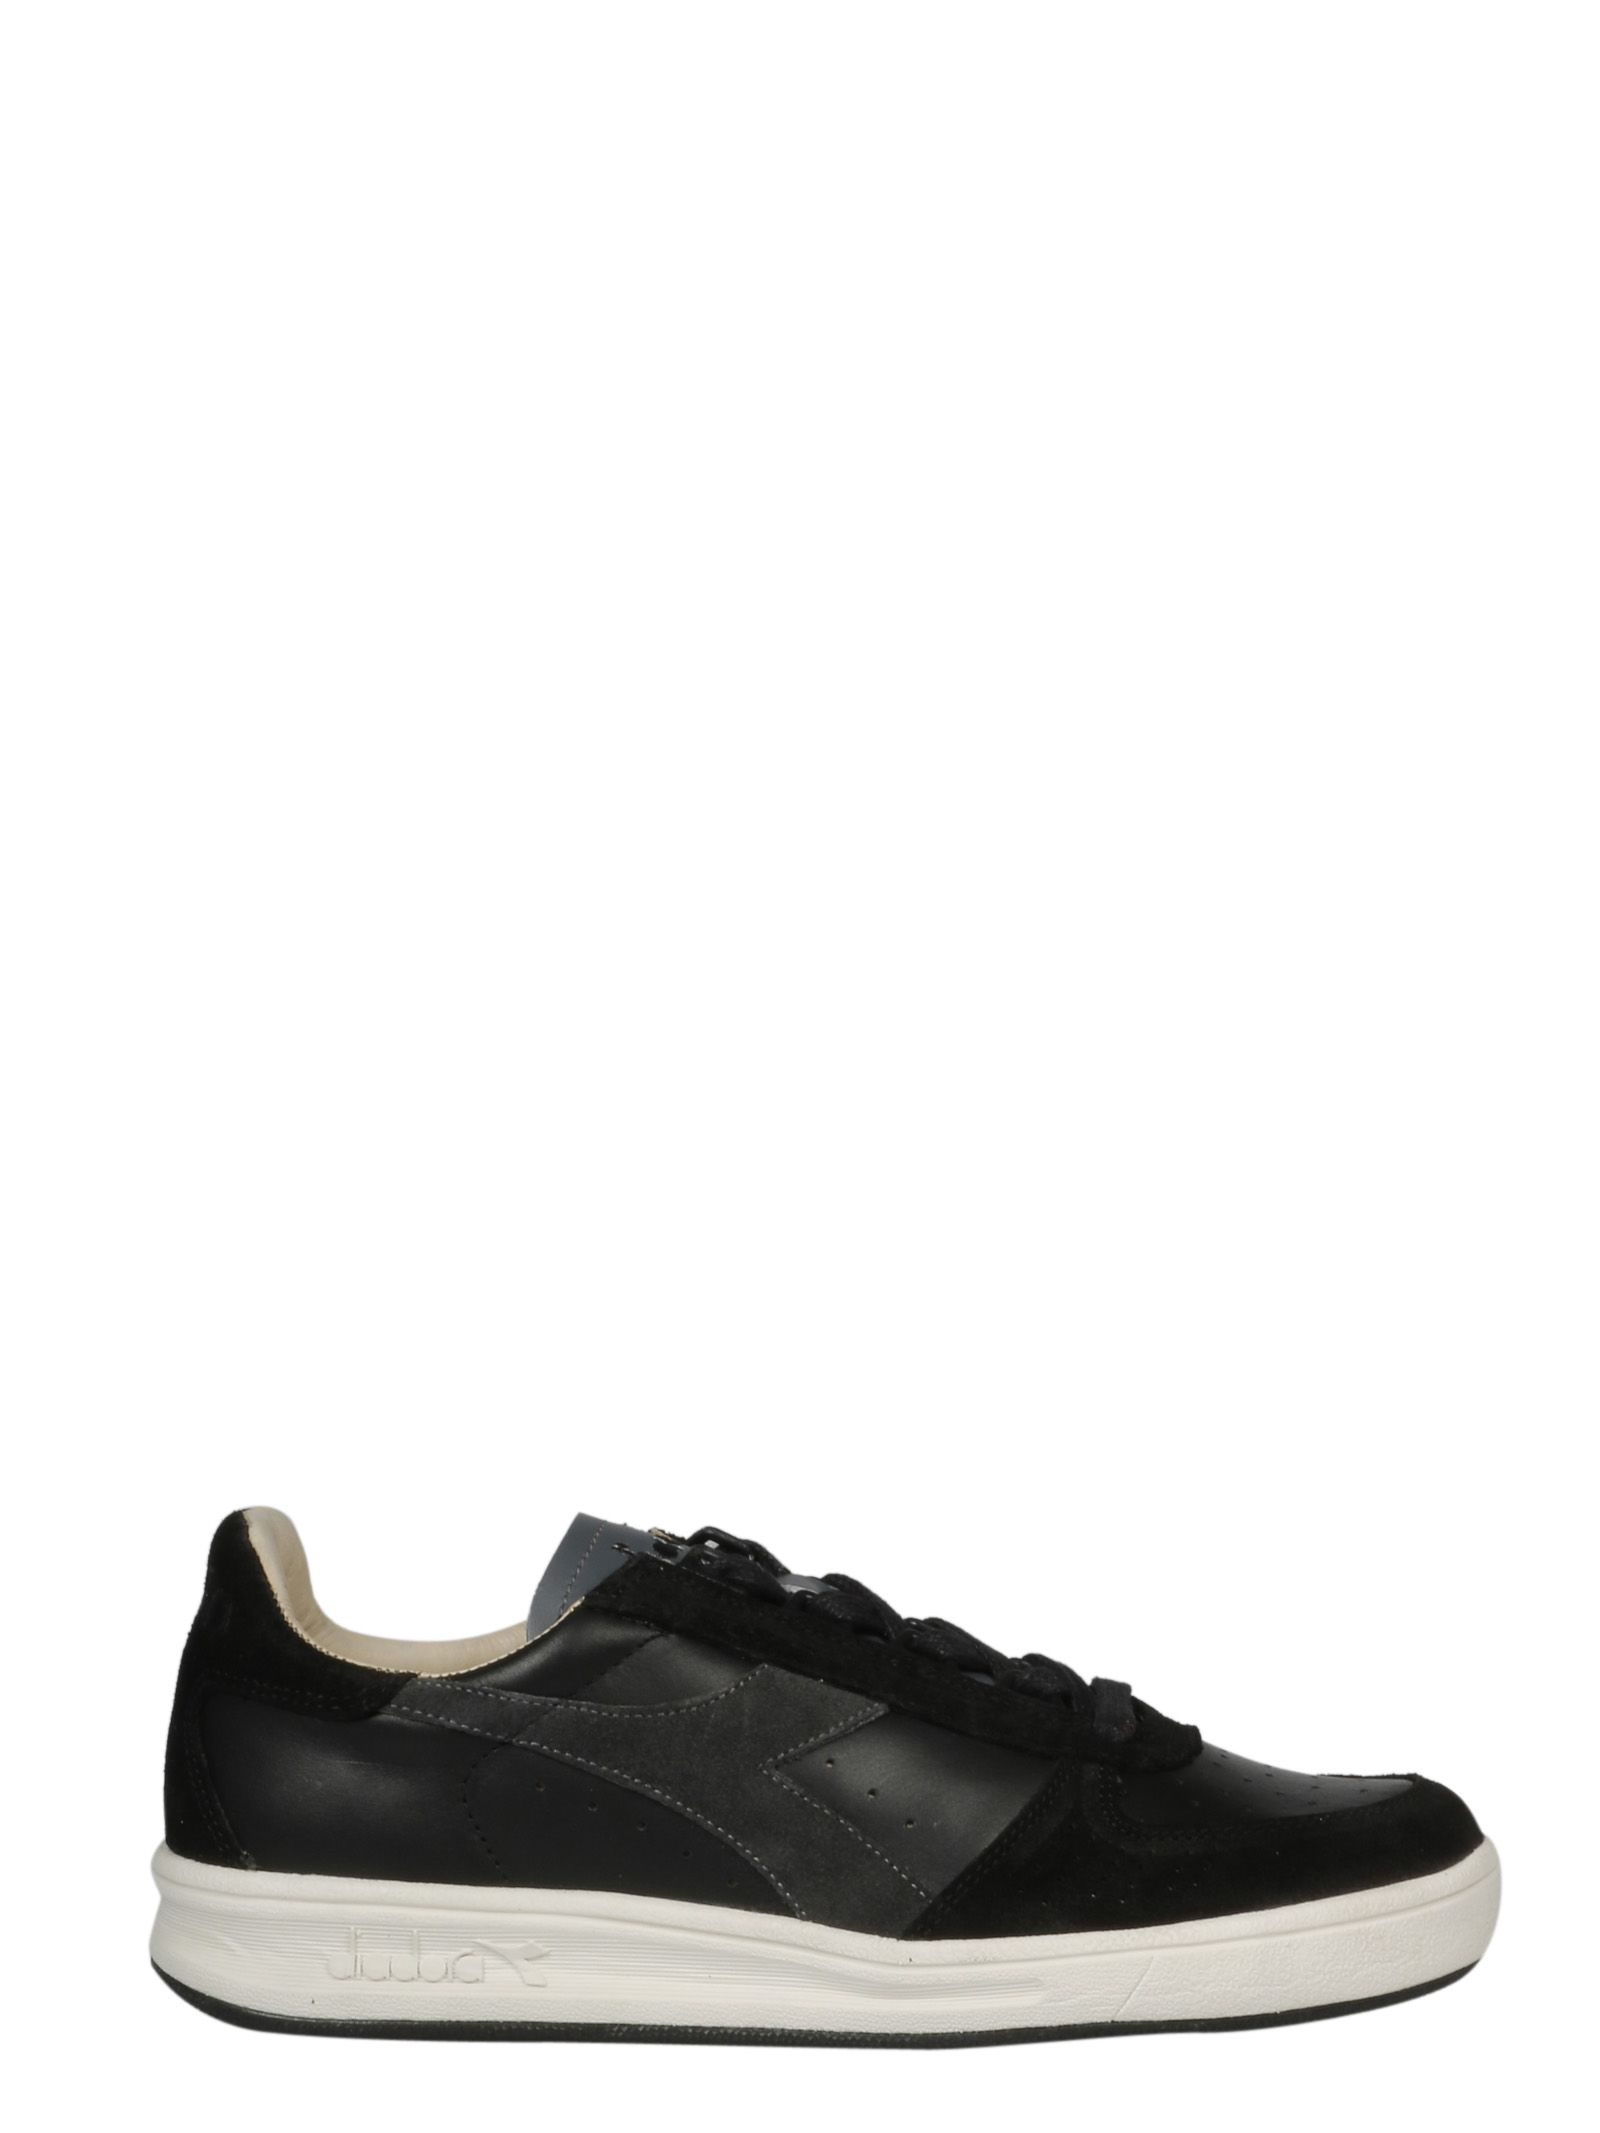 Diadora B Elite Sneakers